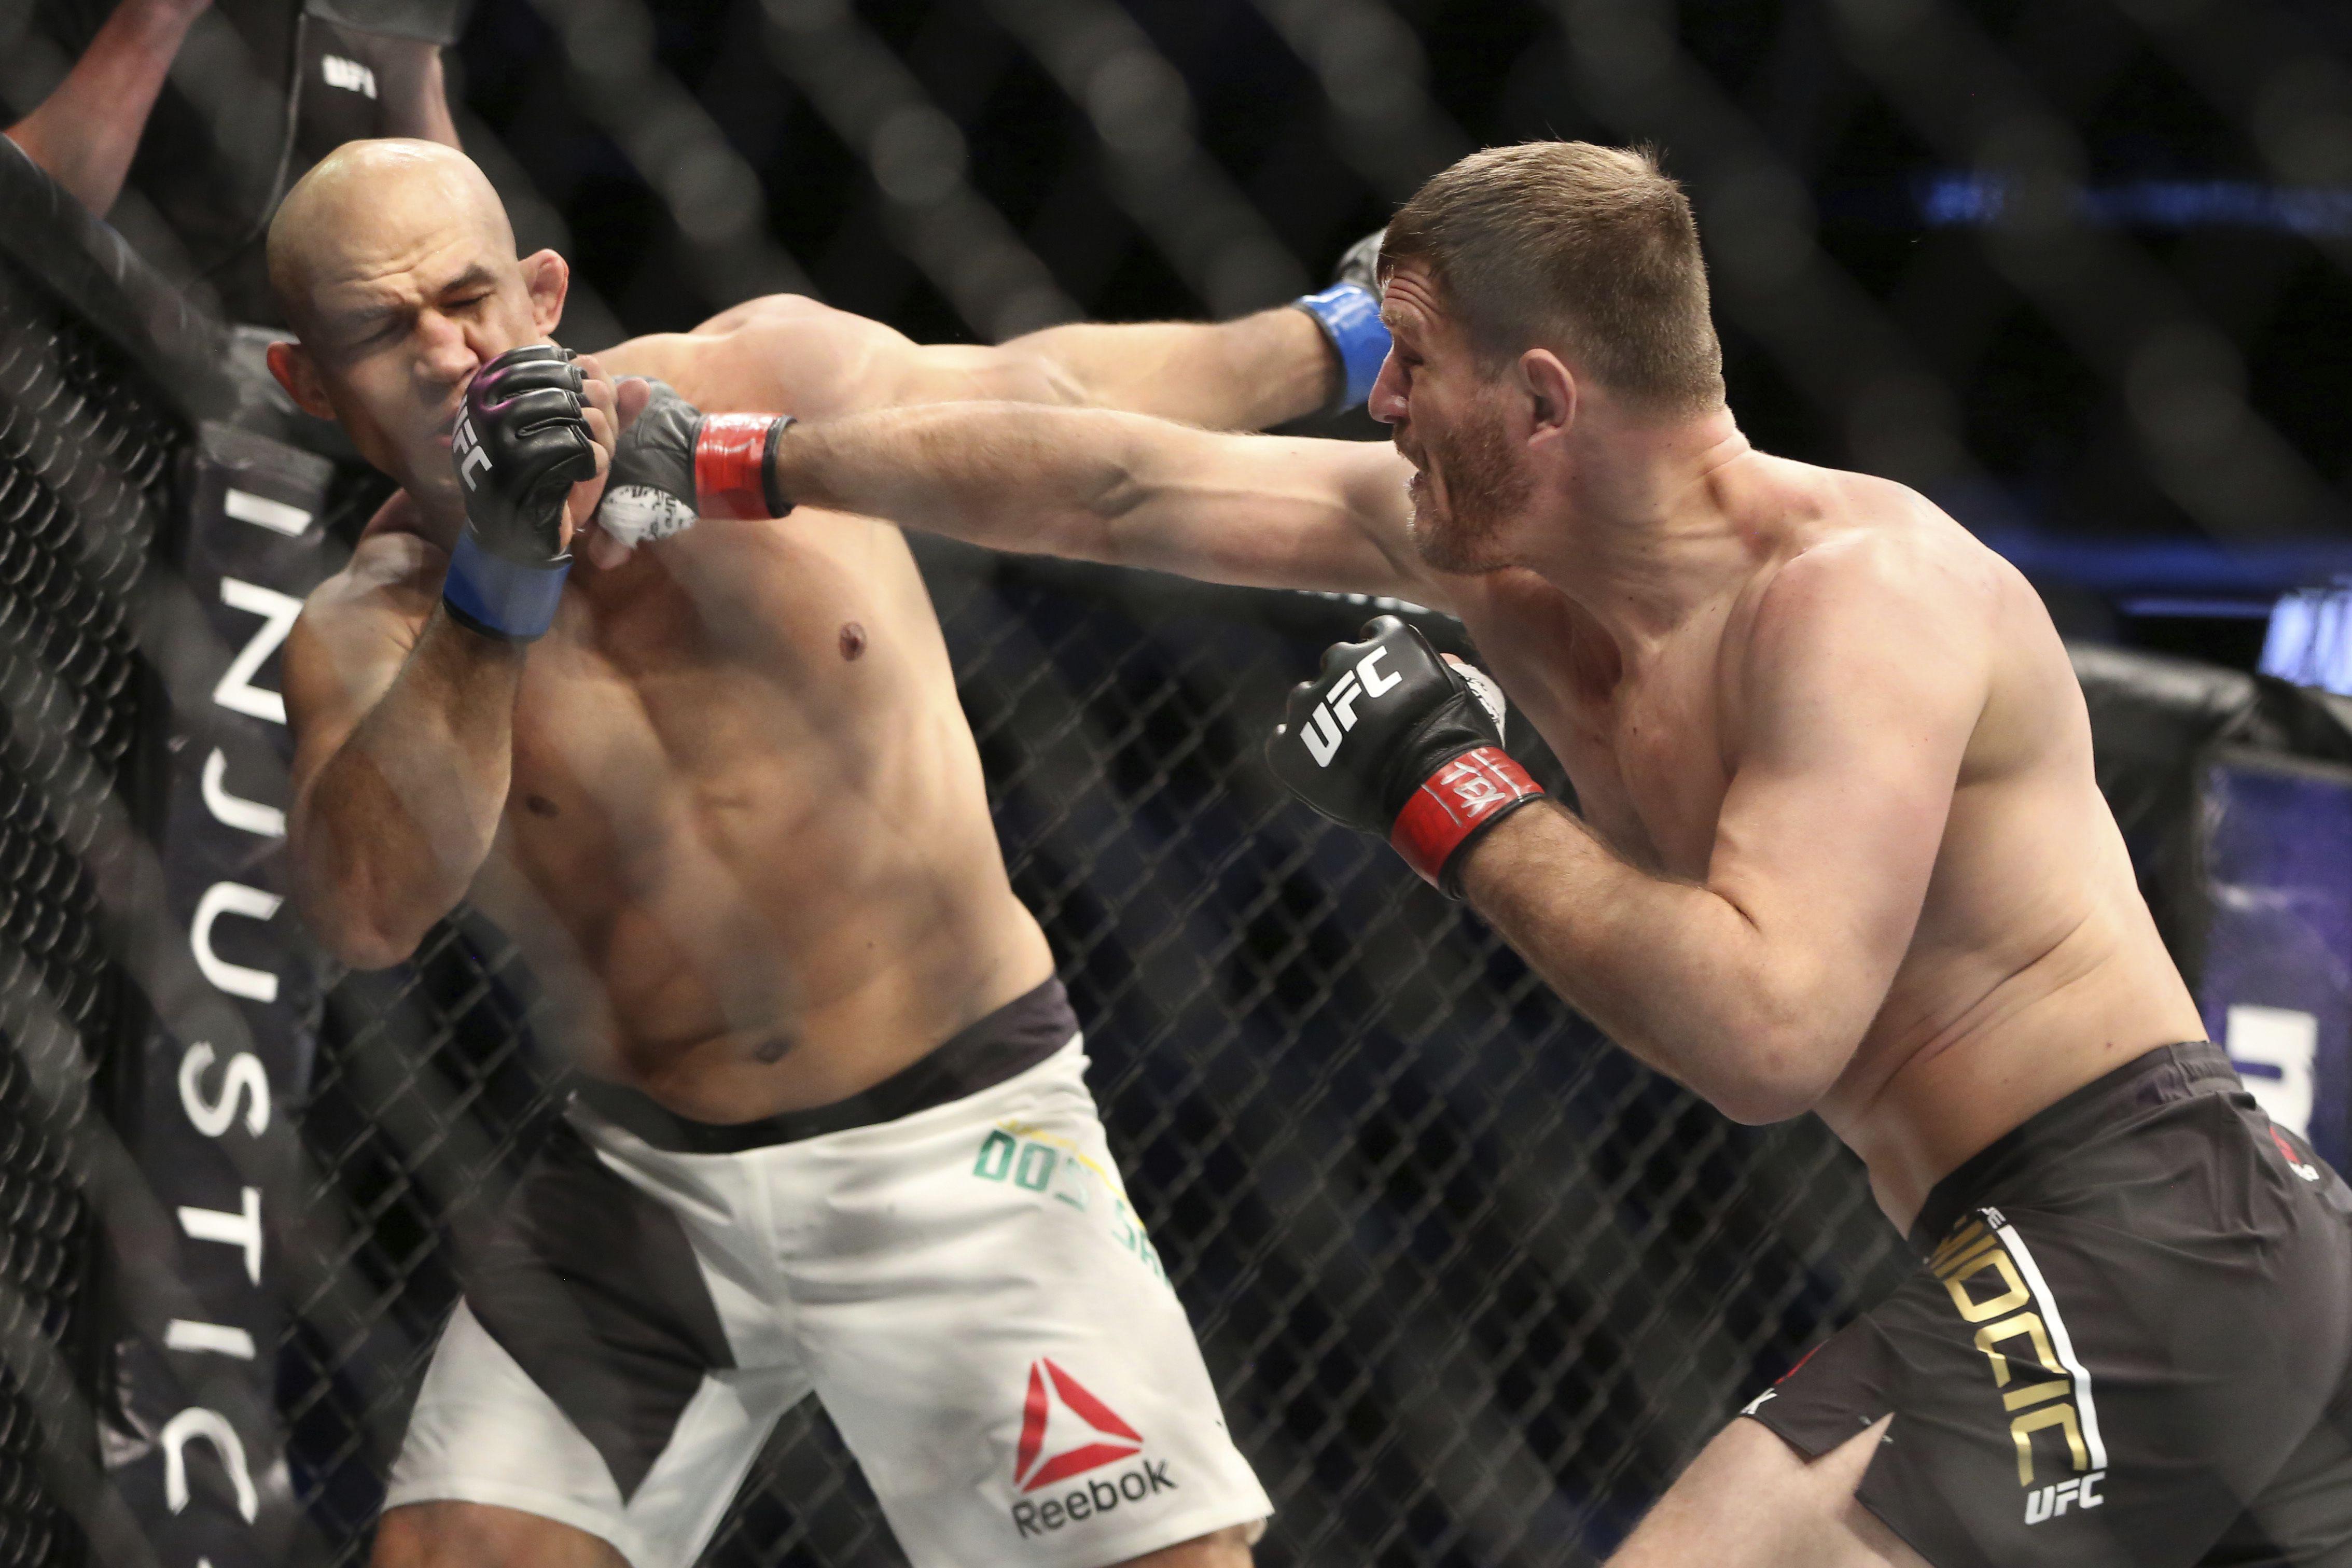 Ufc Fight Night Free Live Stream Watch Derrick Lewis Vs Junior Dos Santos Online 3 9 19 Time Fight Card Tickets Odds Nj Com